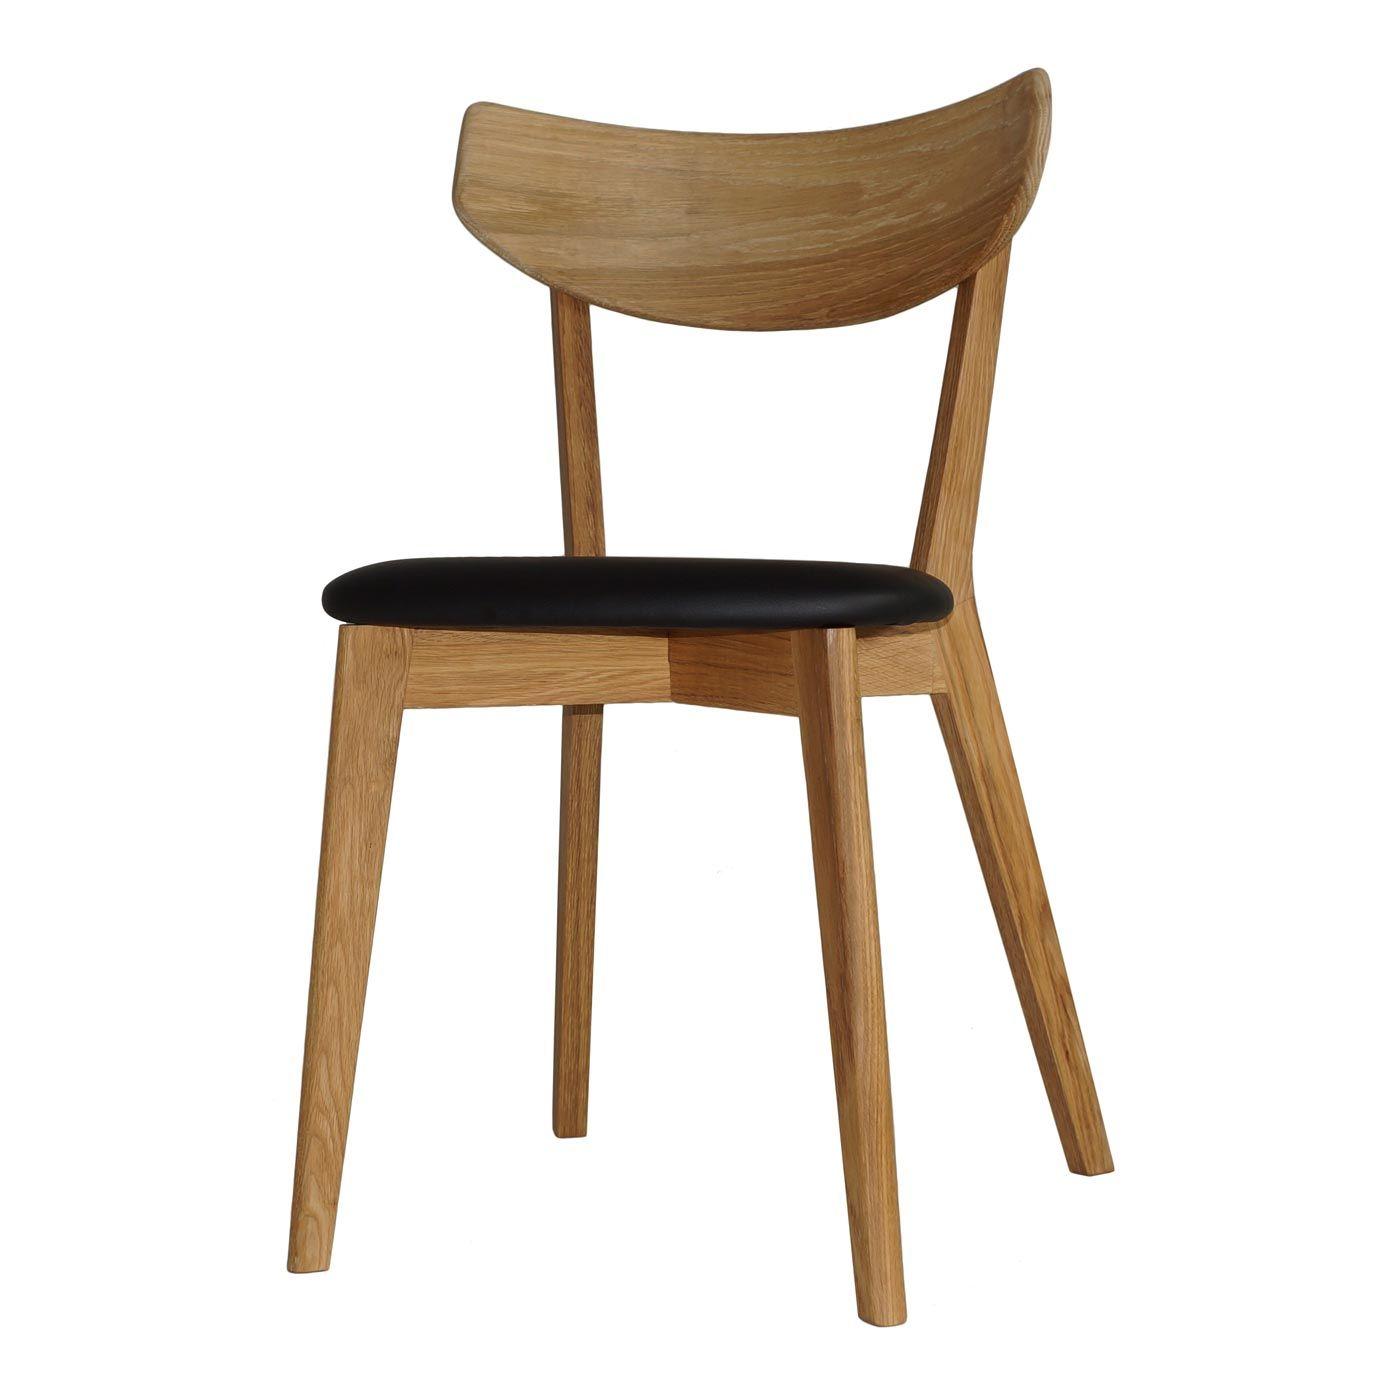 Eiken Houten Eetkamerstoelen.Nordiq Ami Chair Houten Eetkamerstoel Zwarte Bekleding Vintage